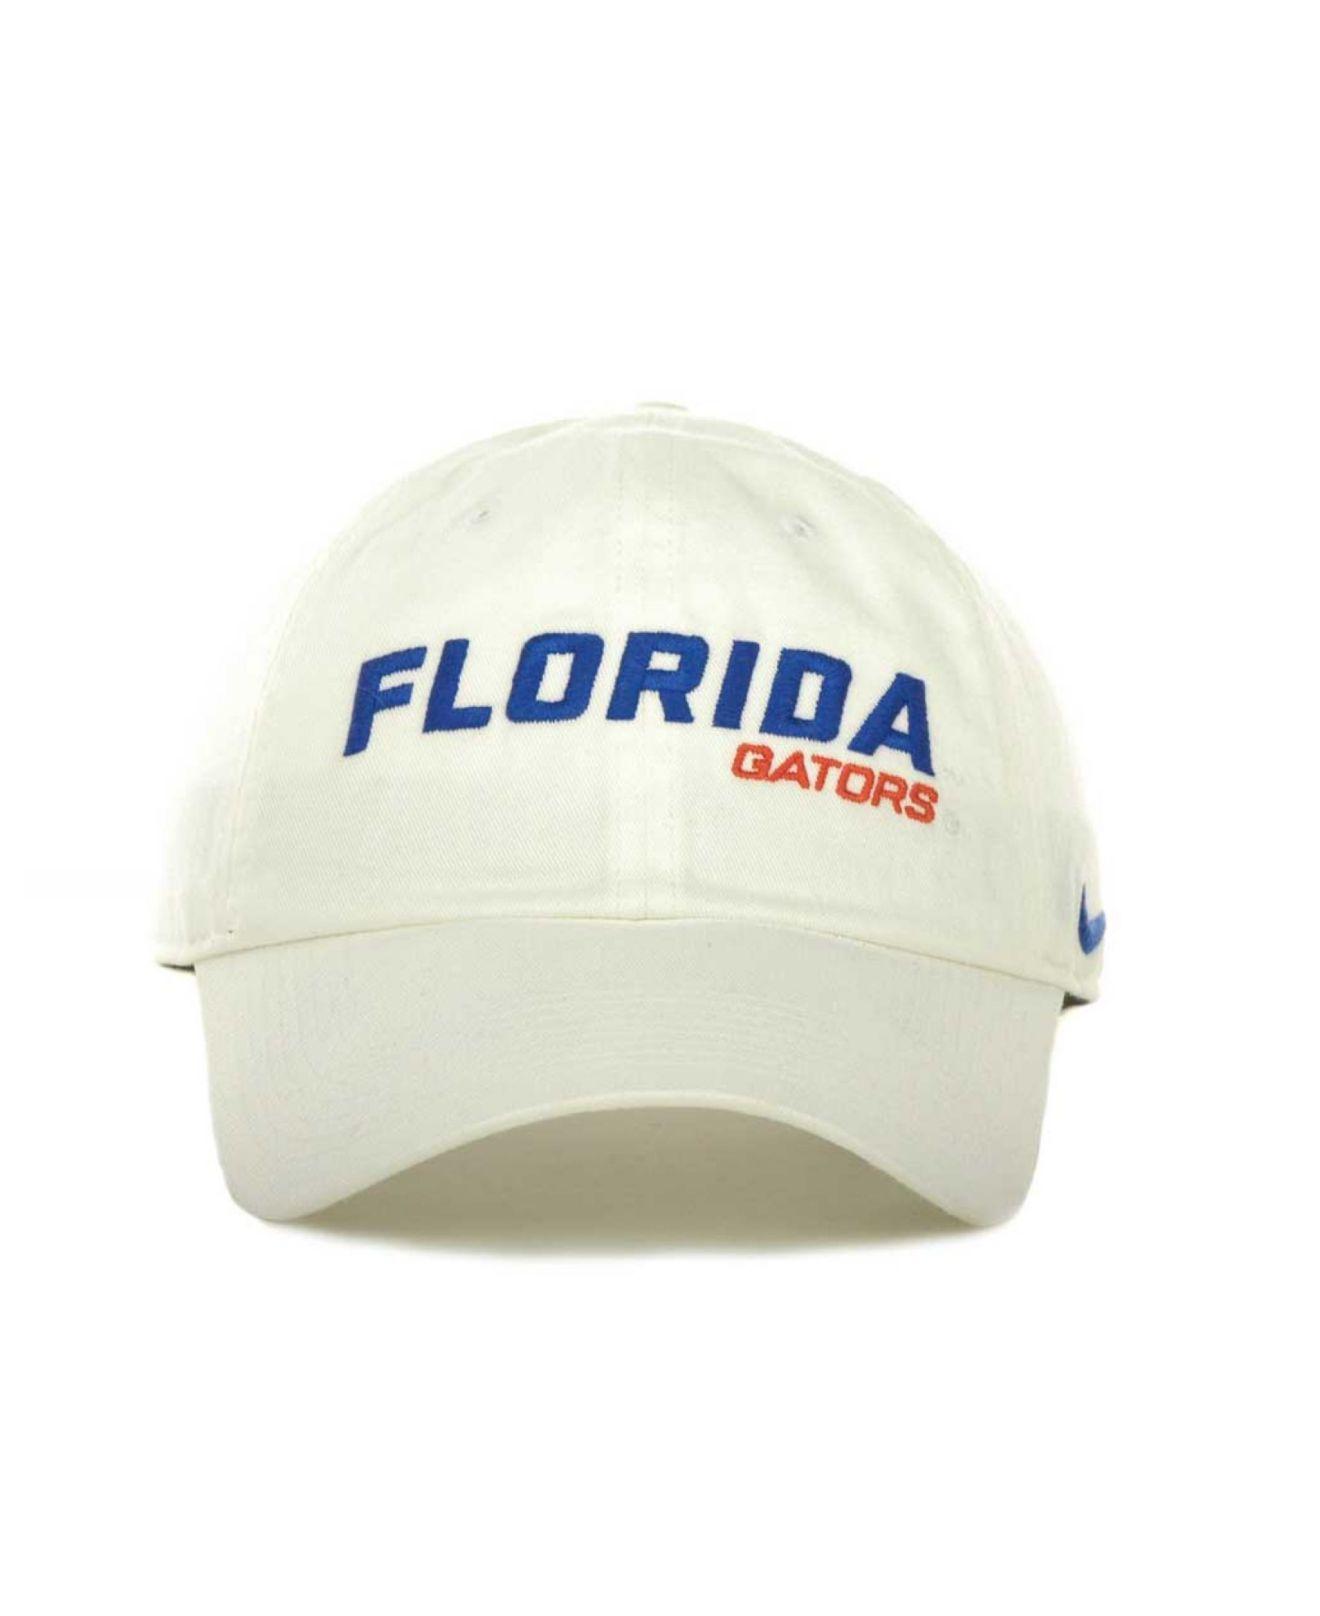 0df1d52473f Lyst - Nike Florida Gators Heritage 86 Campus Cap in White for Men